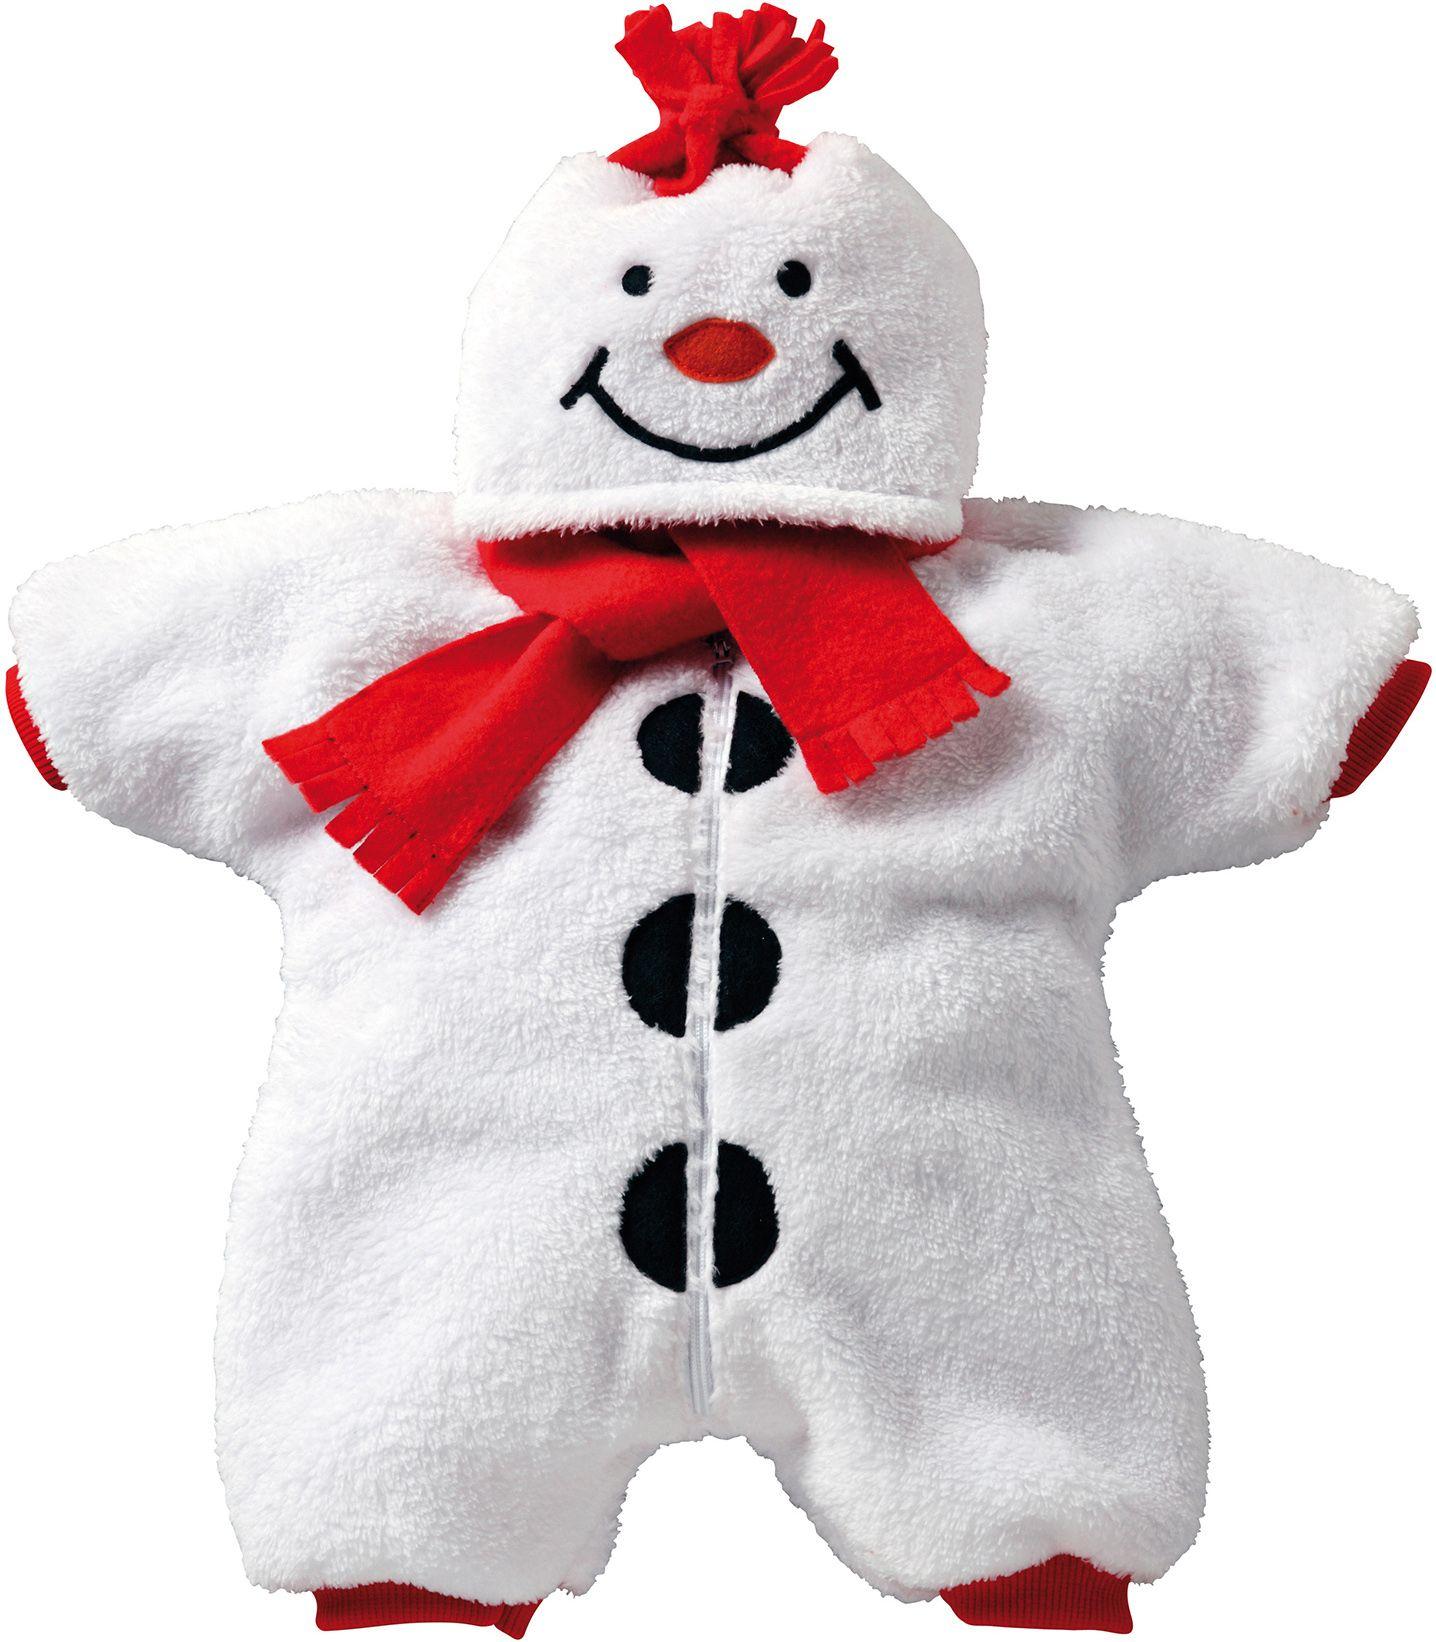 HELESS® Heless® Puppenbekleidung Winteranzug Größe 35-46 cm, »Schneemann«